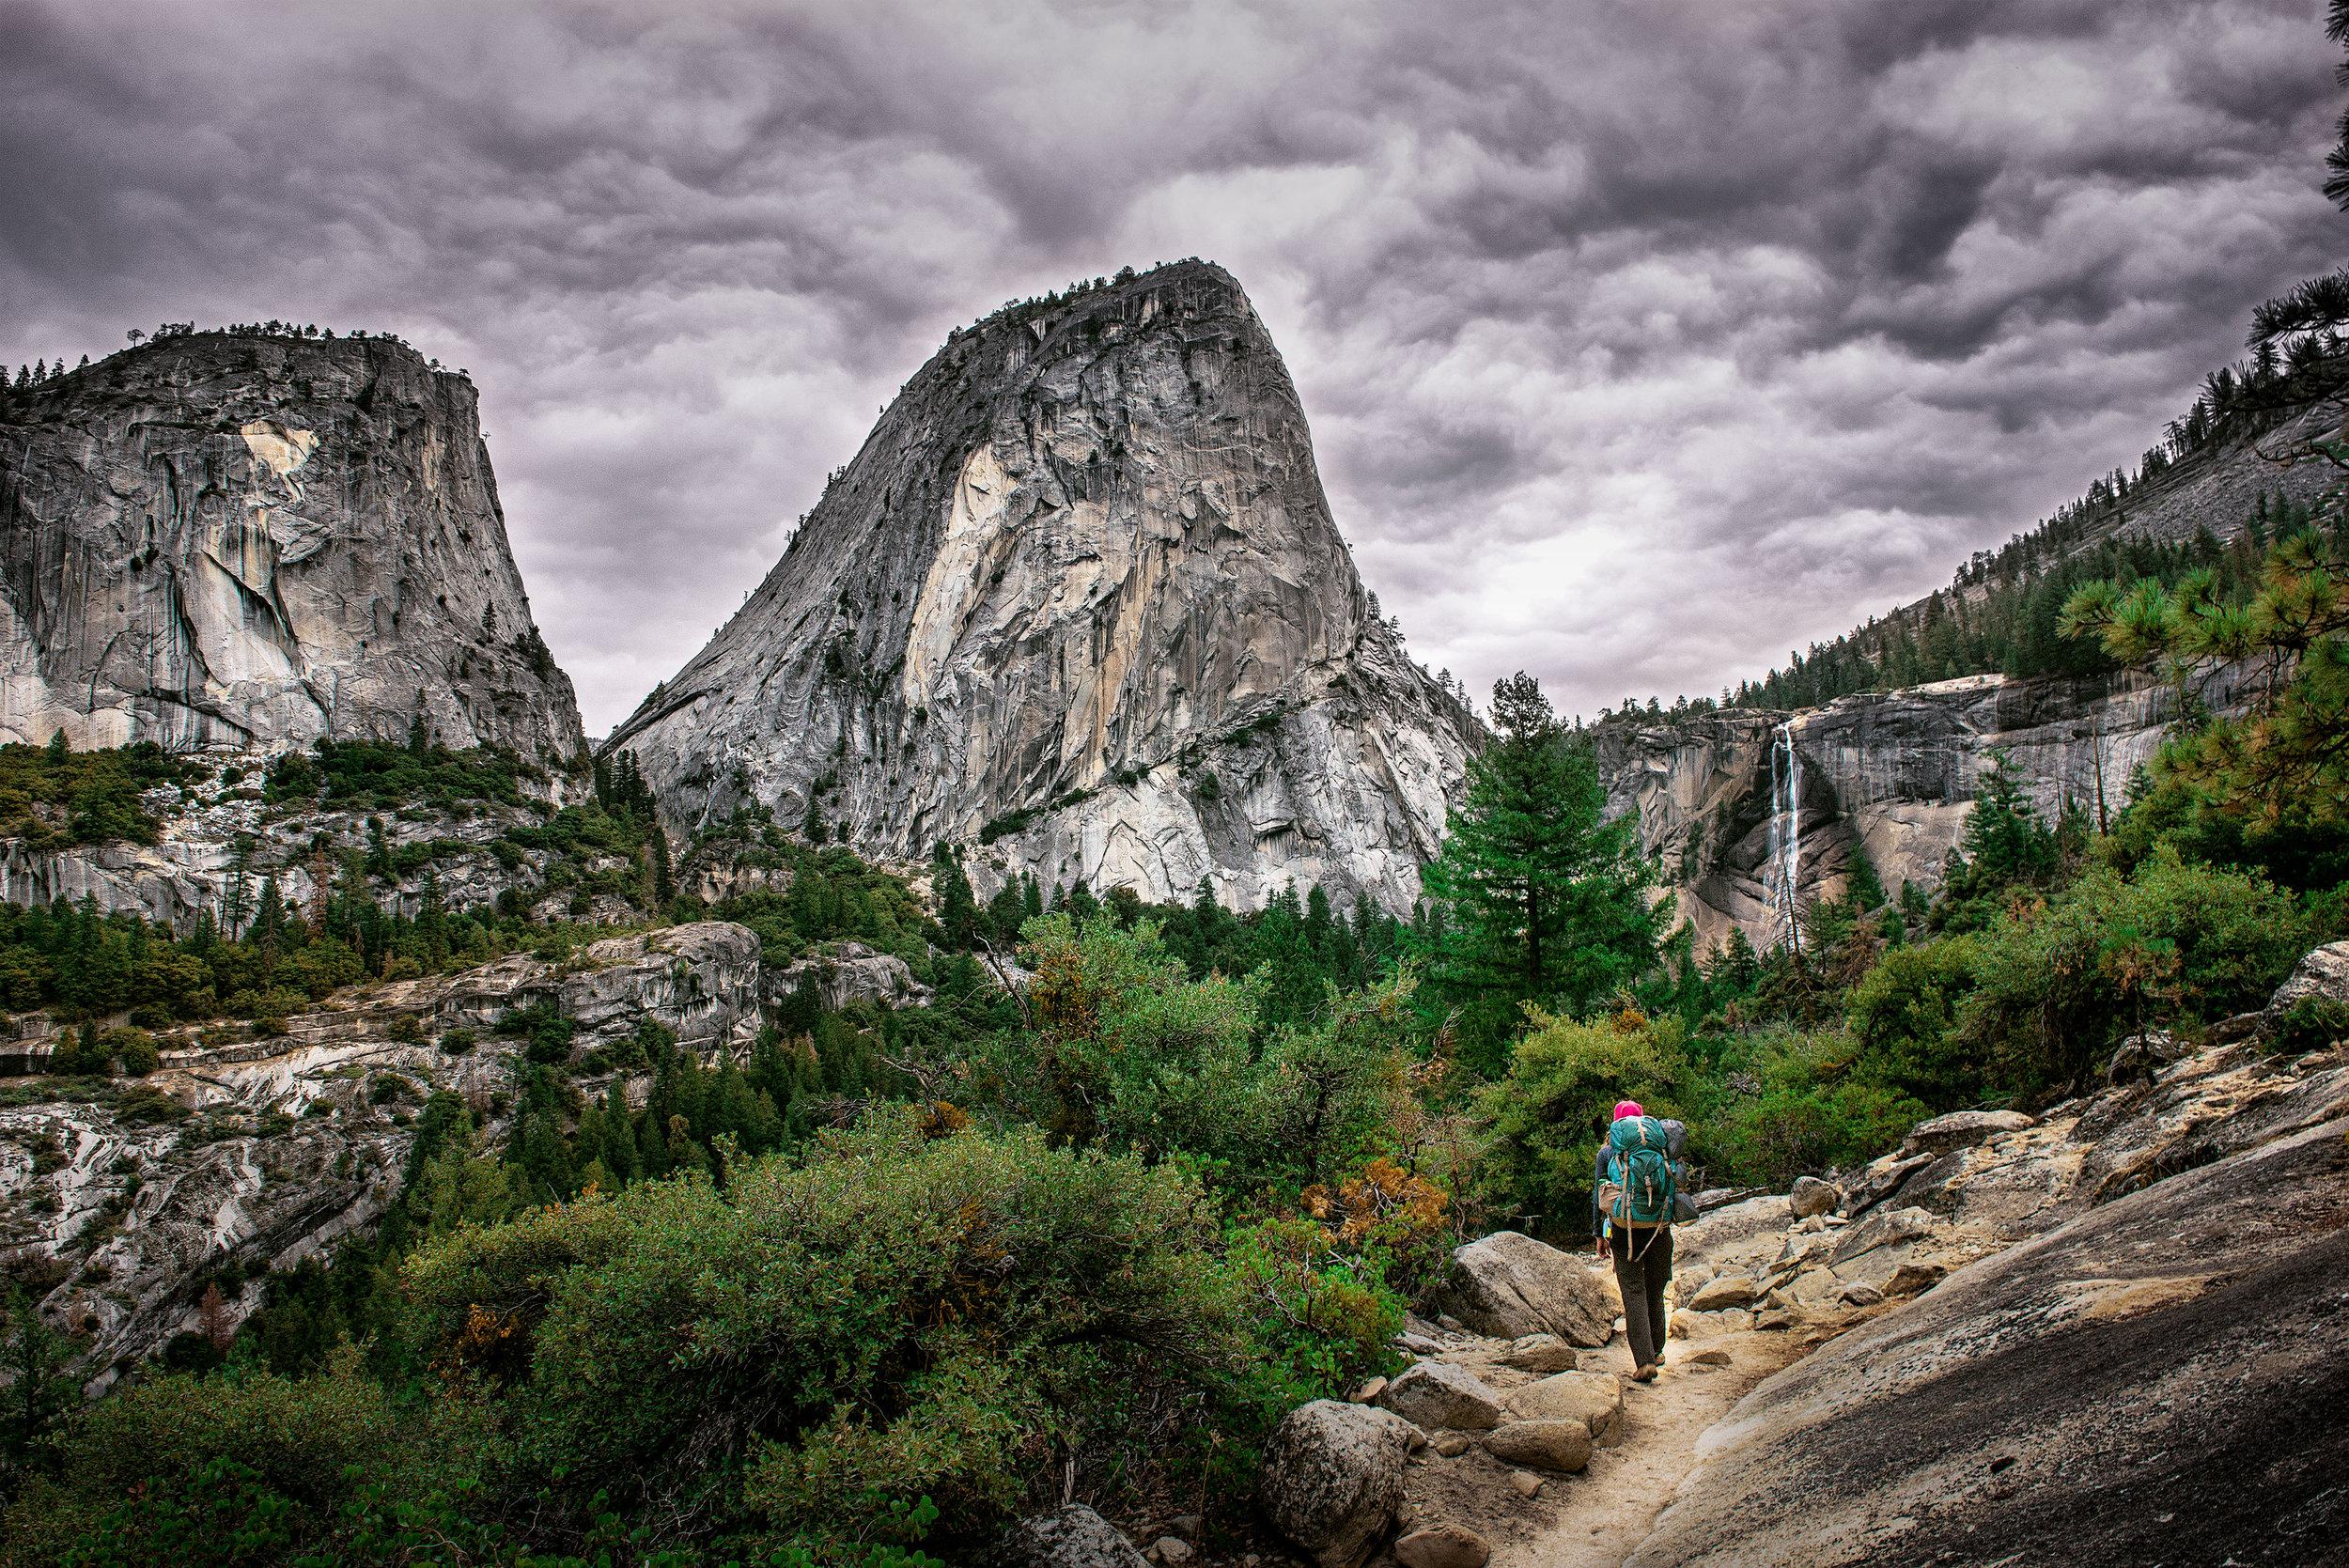 austin-trigg-yosemite-national-park-hiking-waterfall-dome-rock-trail-liberty-Cap.jpg